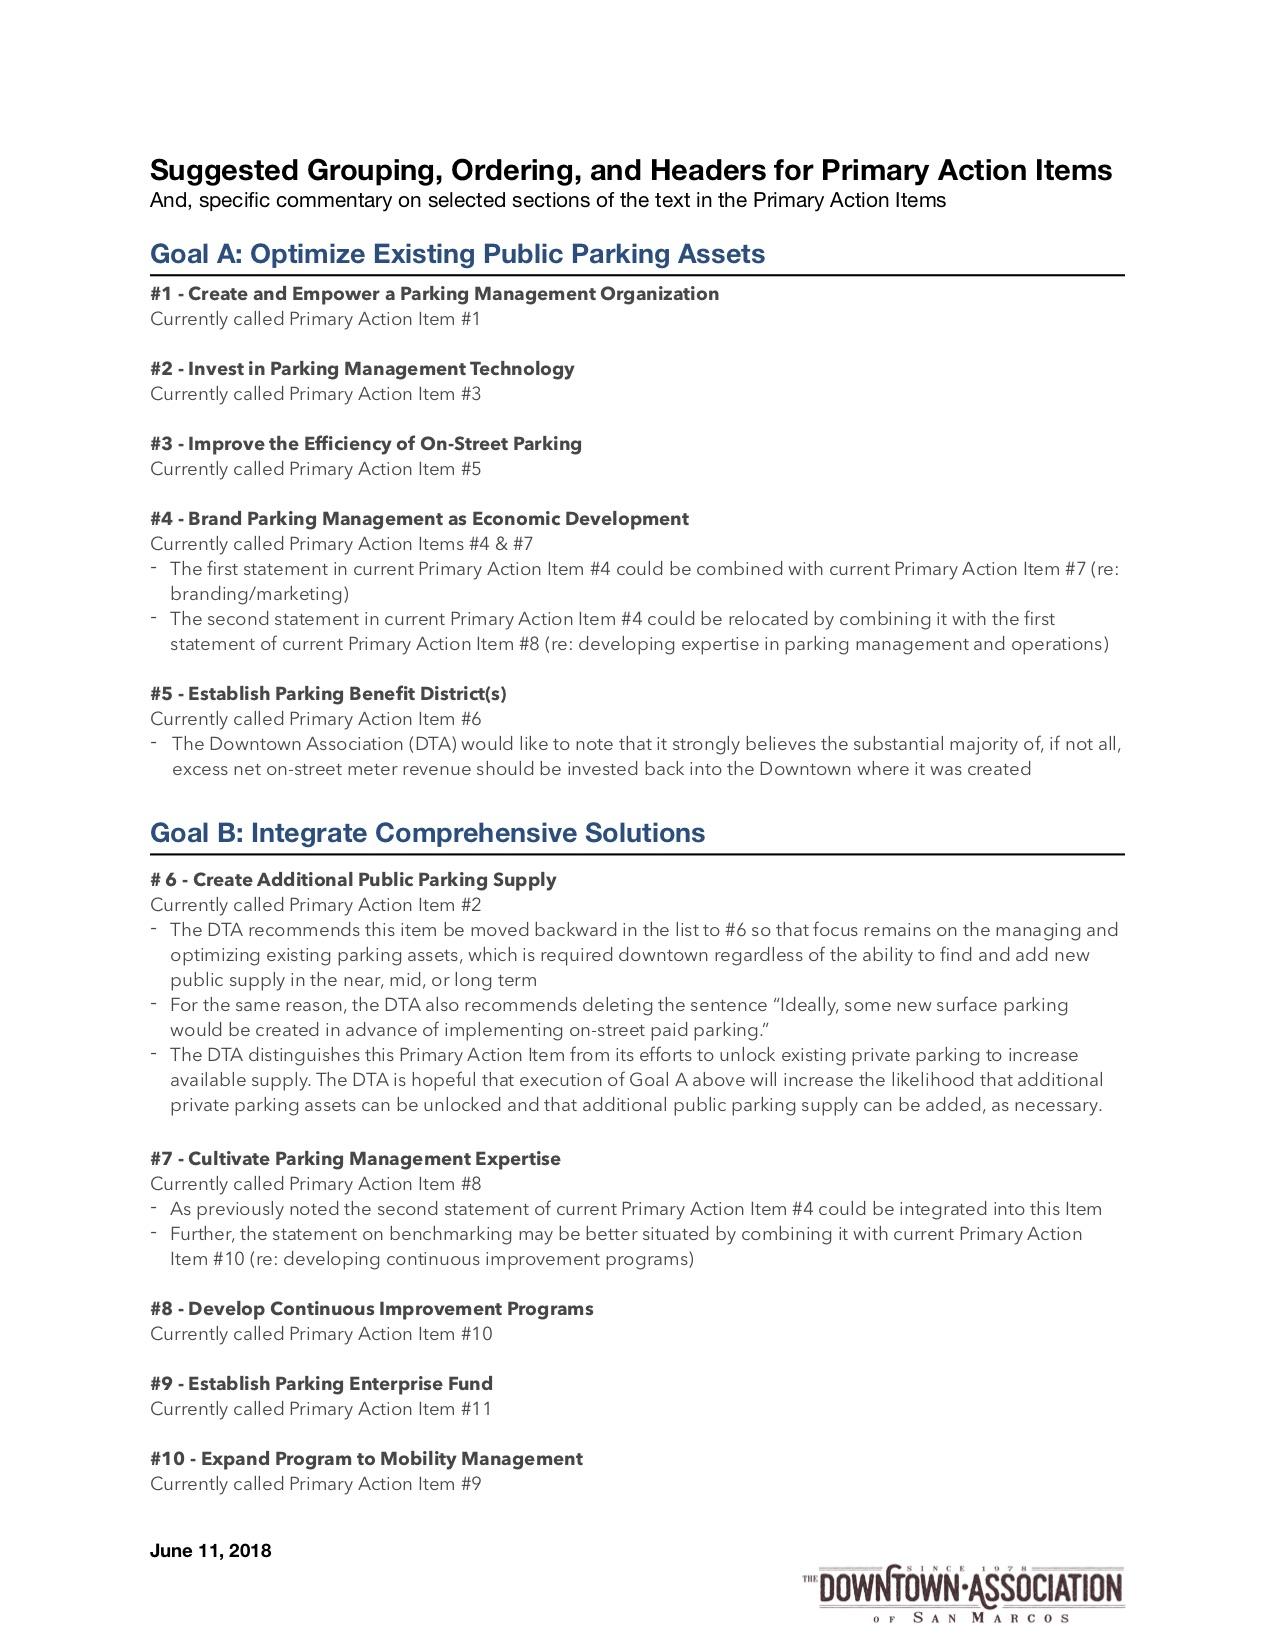 20180611-PPF Action Item DTA Subcom Recommendations-Signed PG 2.jpg